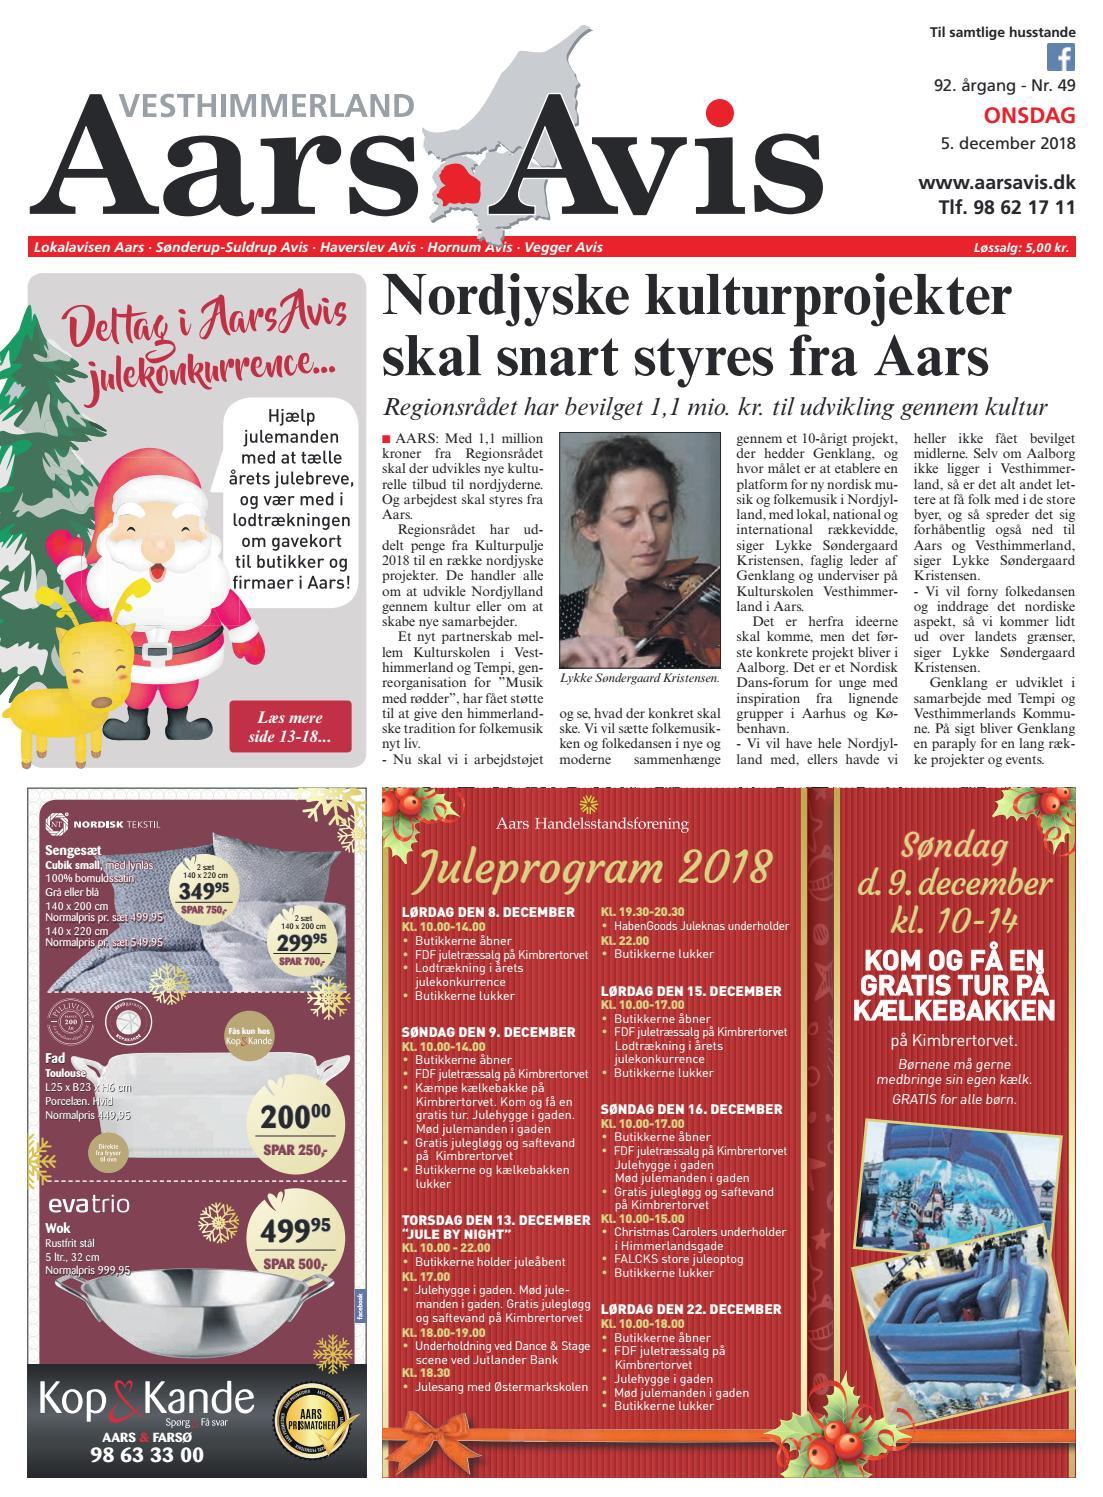 52c1aeb7e8c Aars Avis nr. 49 - 2018 by Aars Avis - issuu